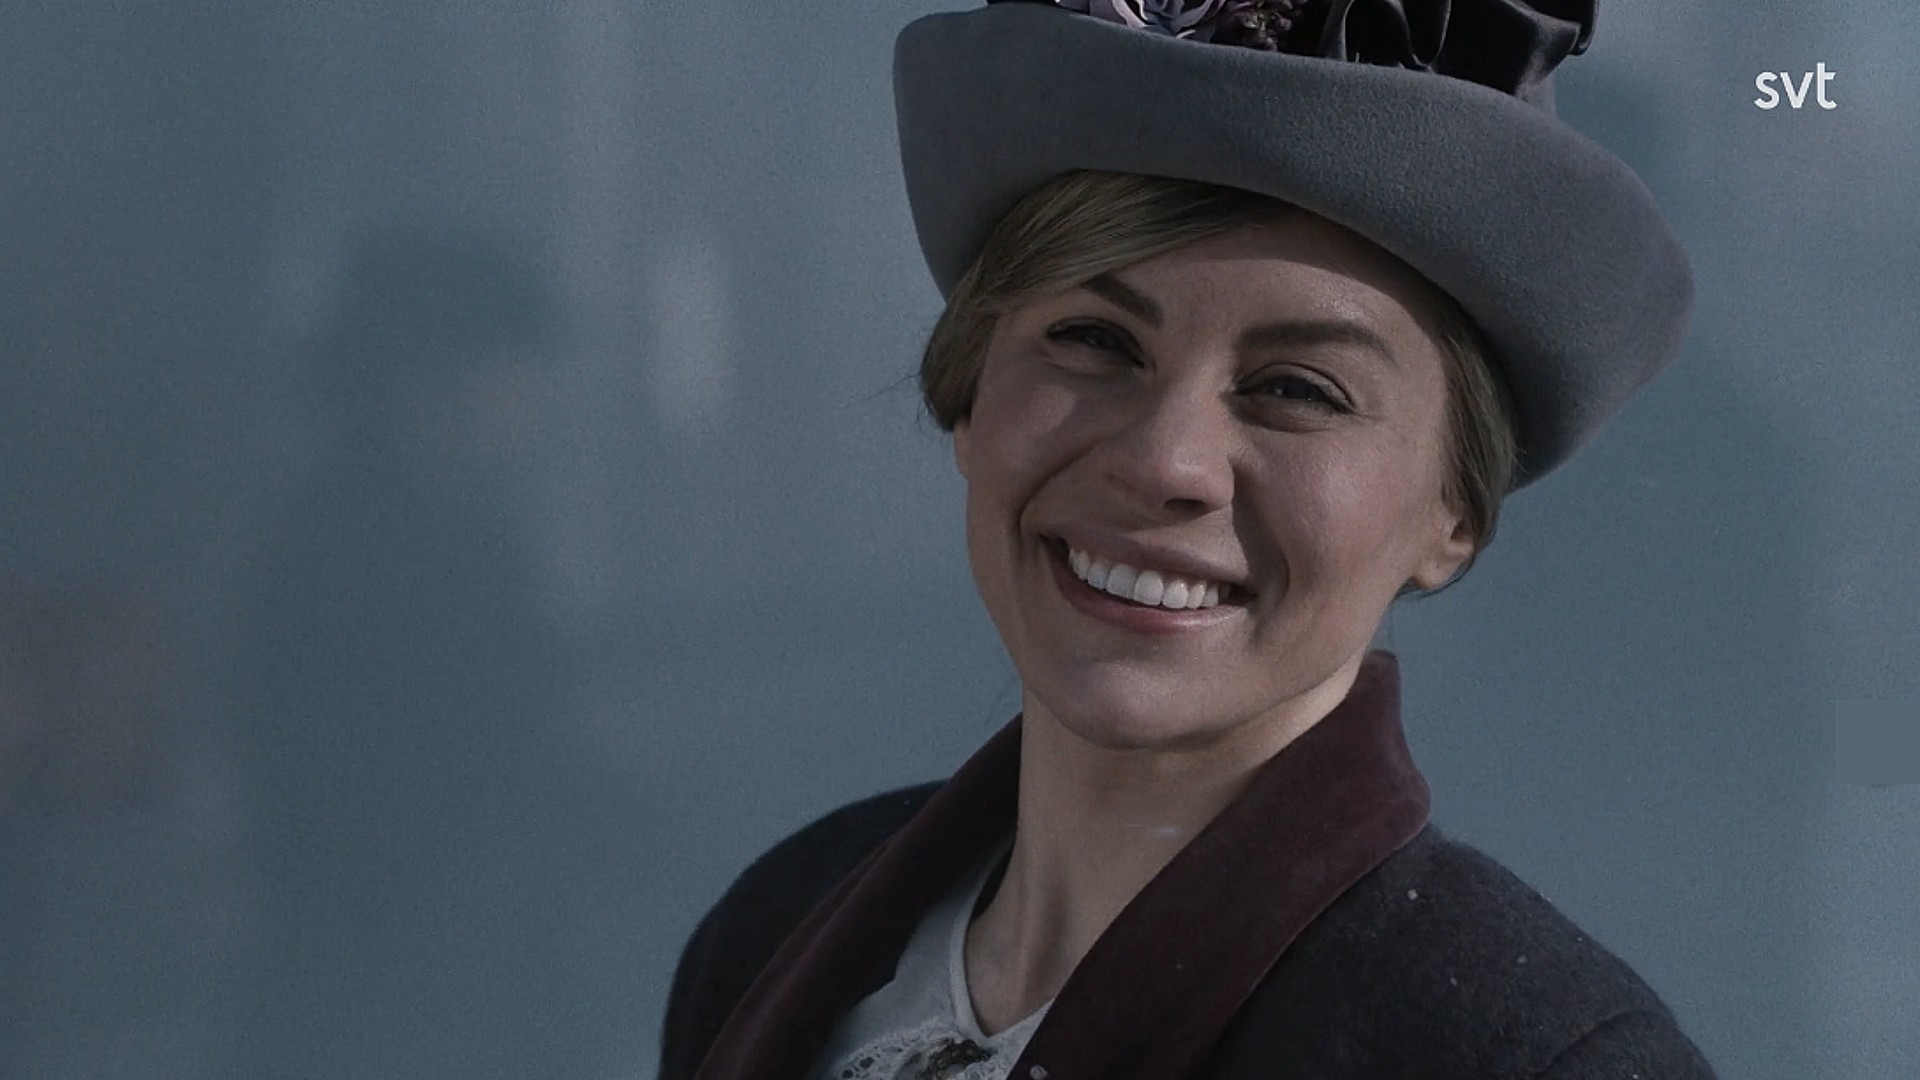 Therese Lindgrens rollfigur Greta träffar sin Ivar i Mirakel